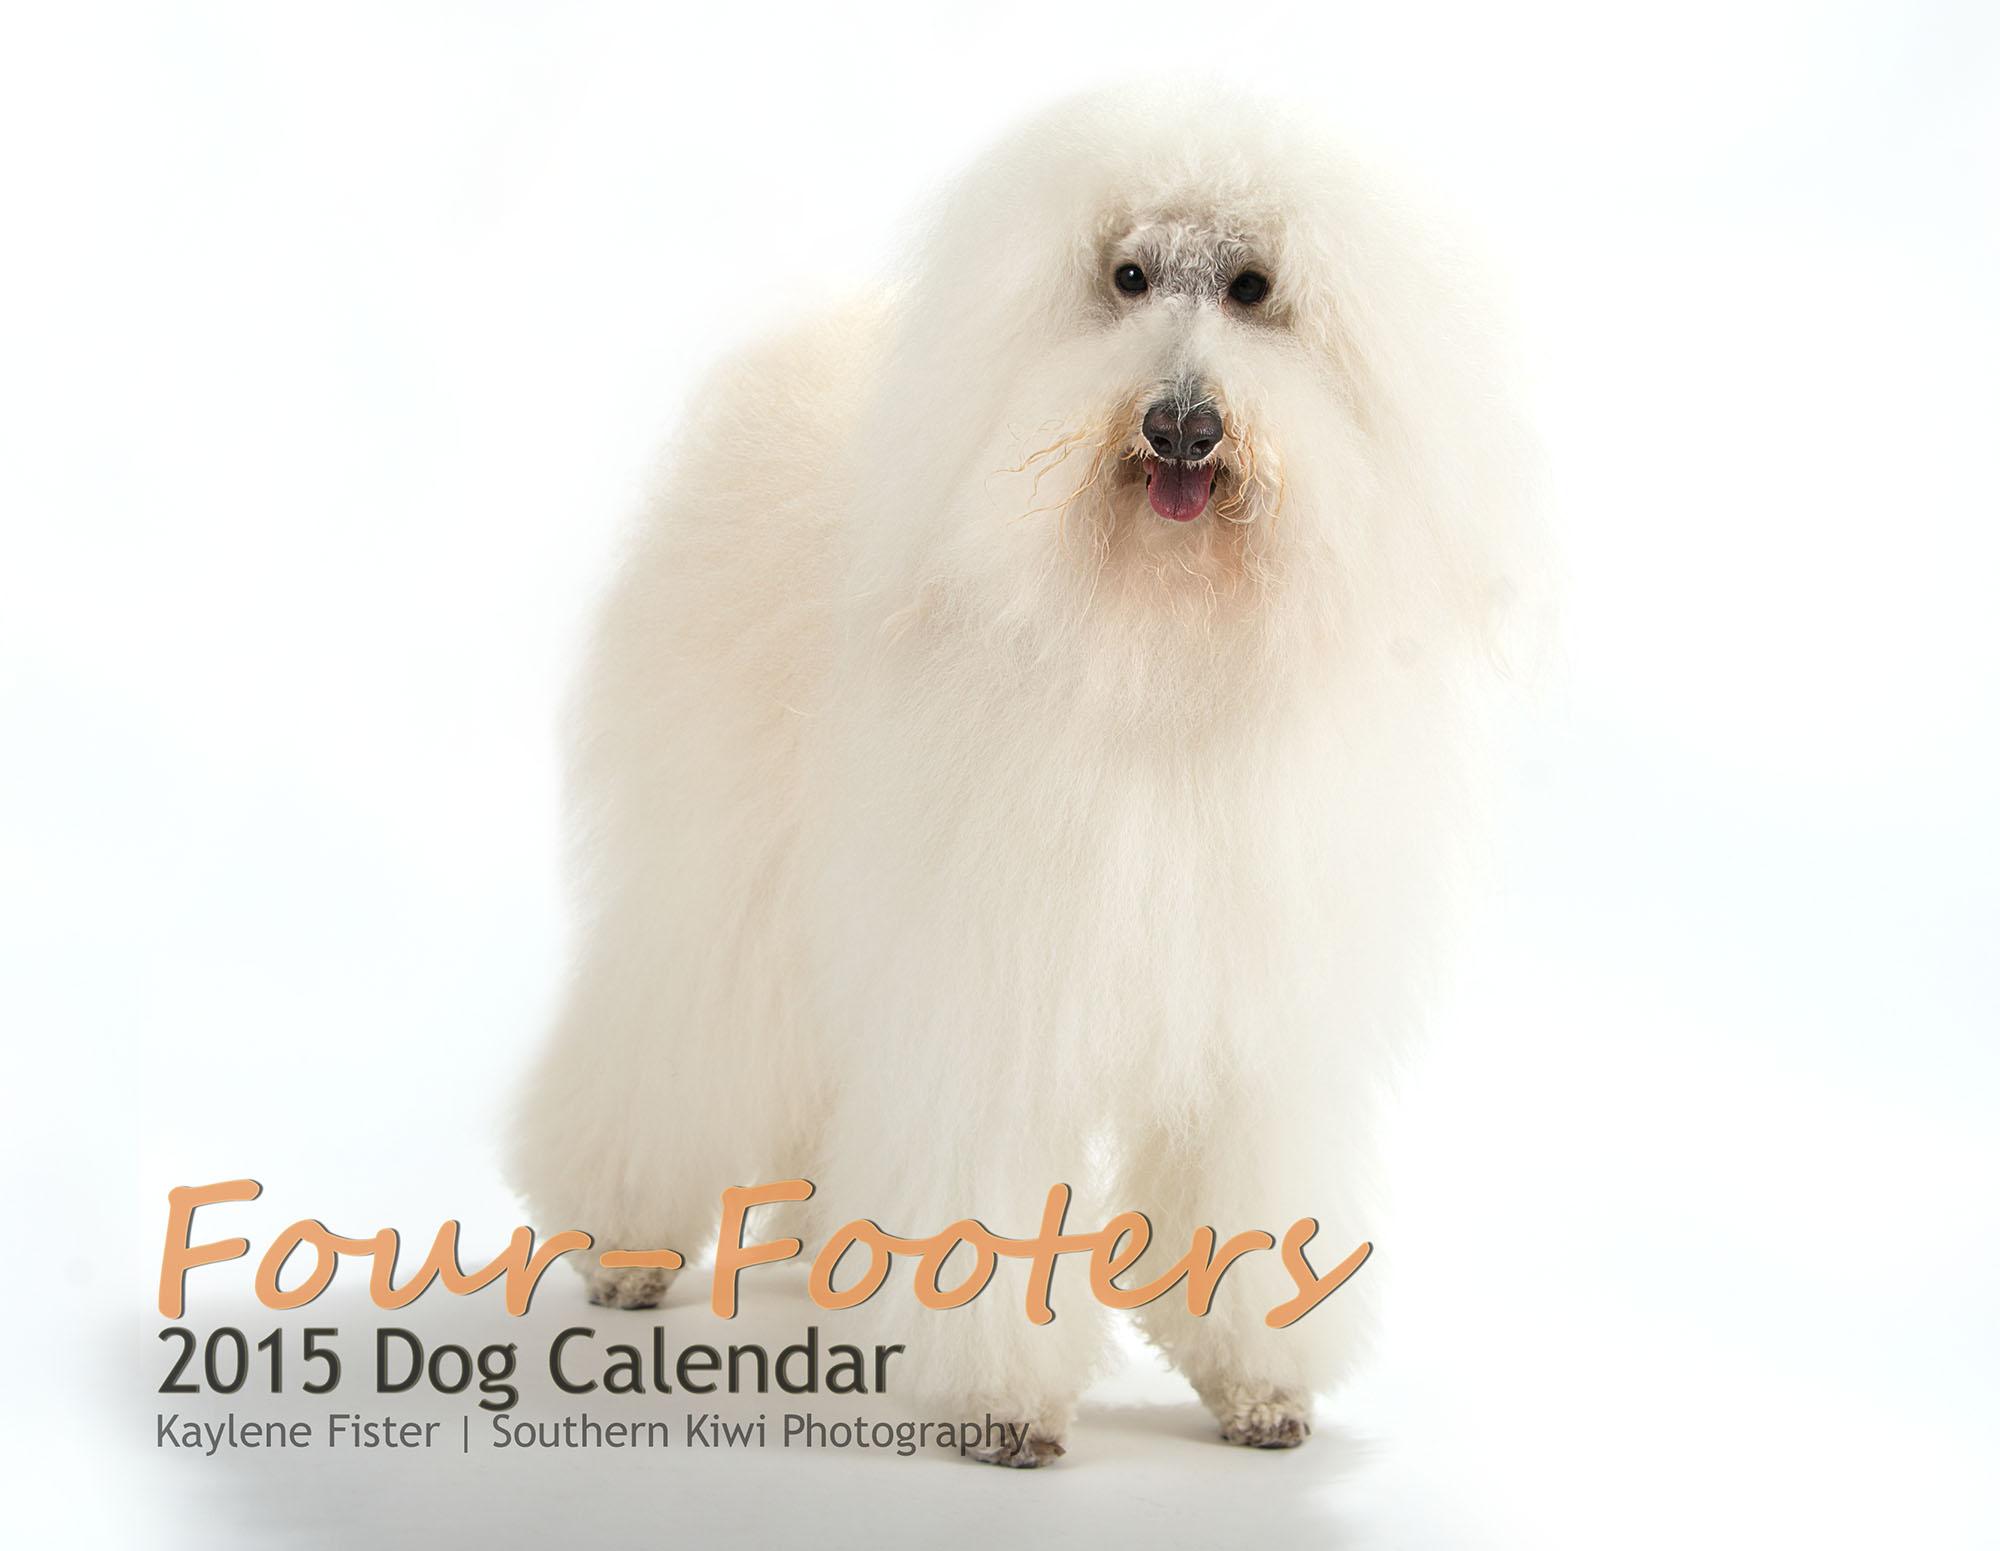 2015 Dog Calendar Front Cover.jpg